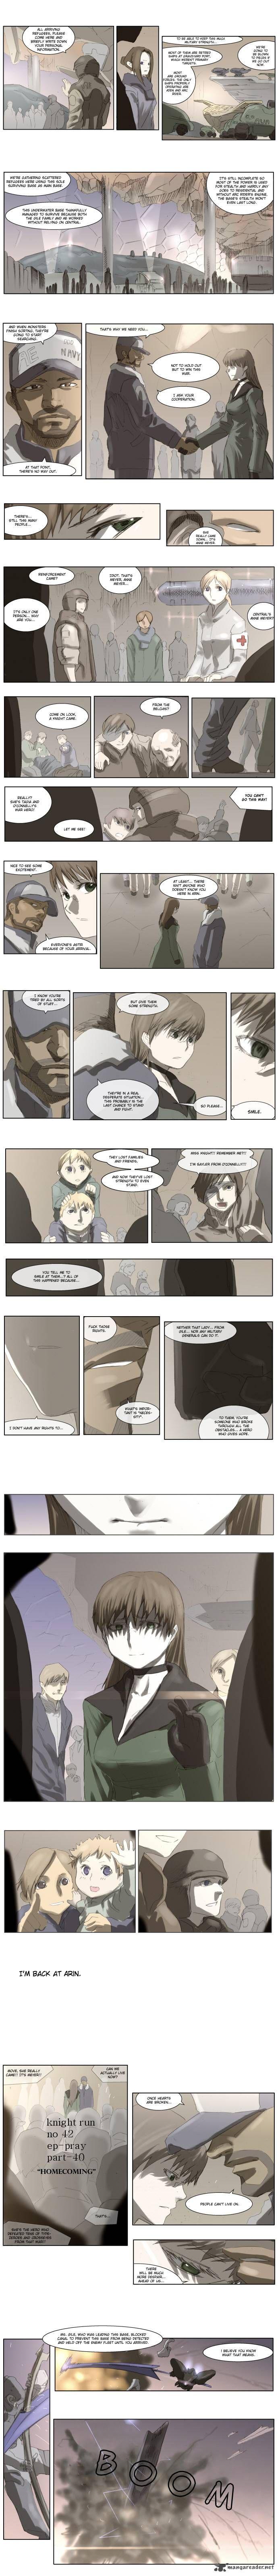 Knight Run 42 Page 2